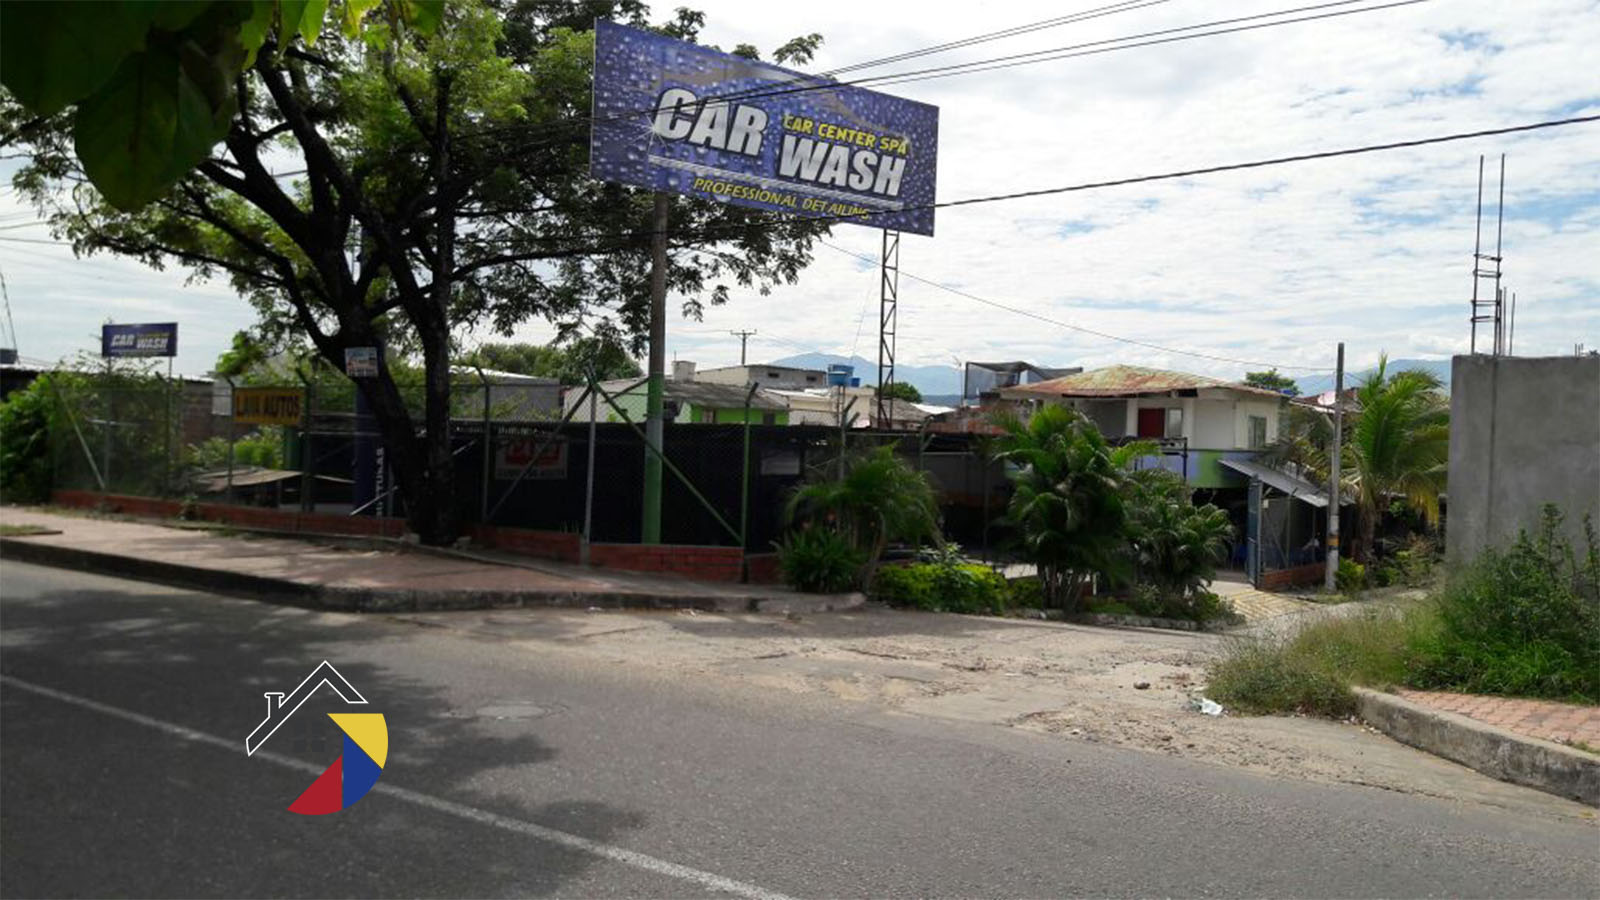 SE VENDE AUTOLAVADO EN NEIVA, COLOMBIA